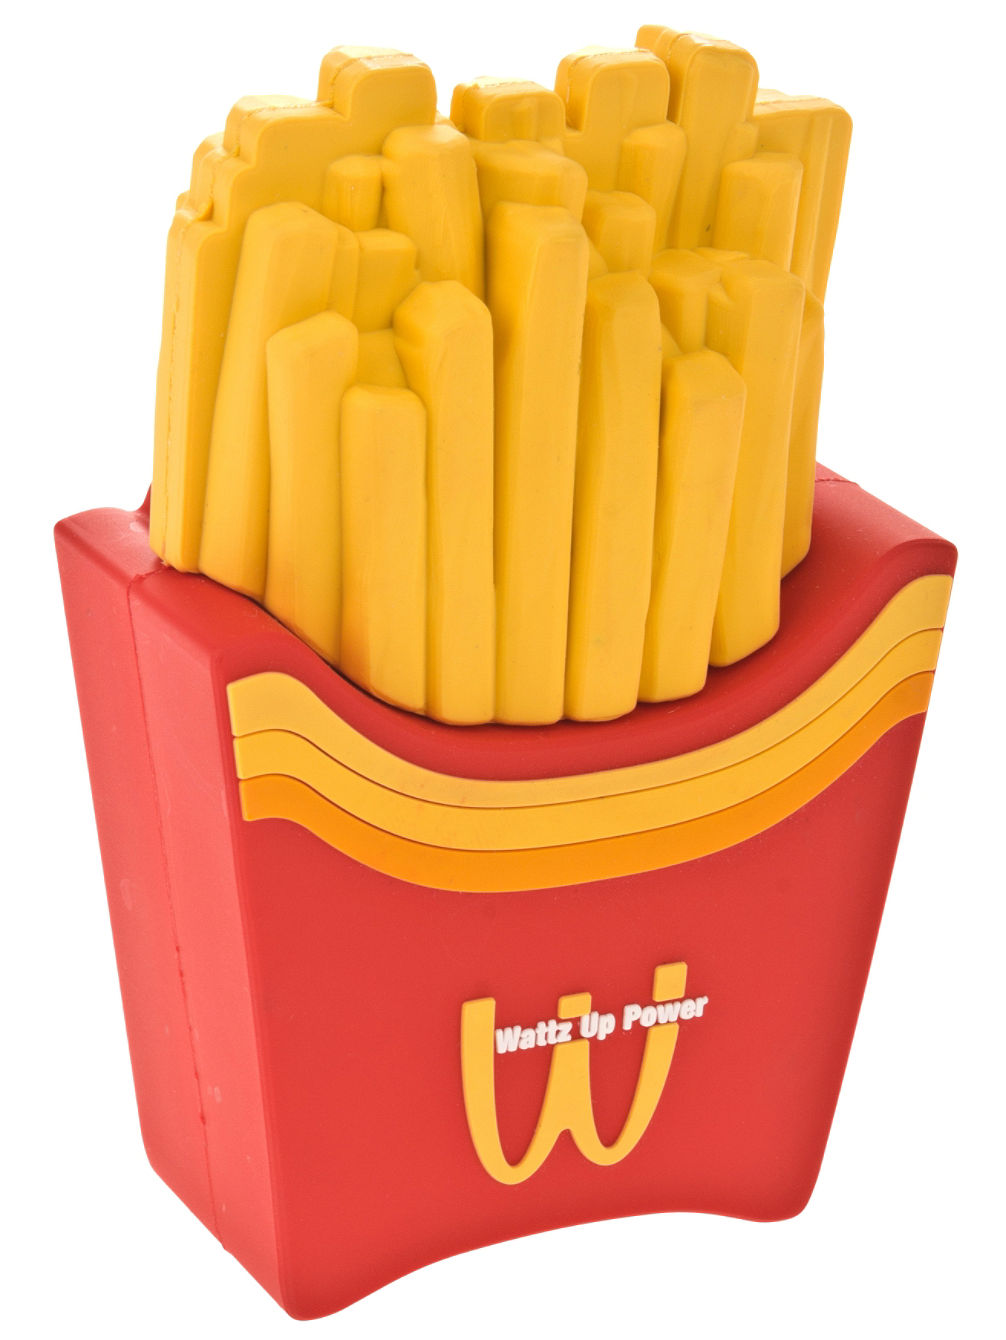 fry-or-die-charger